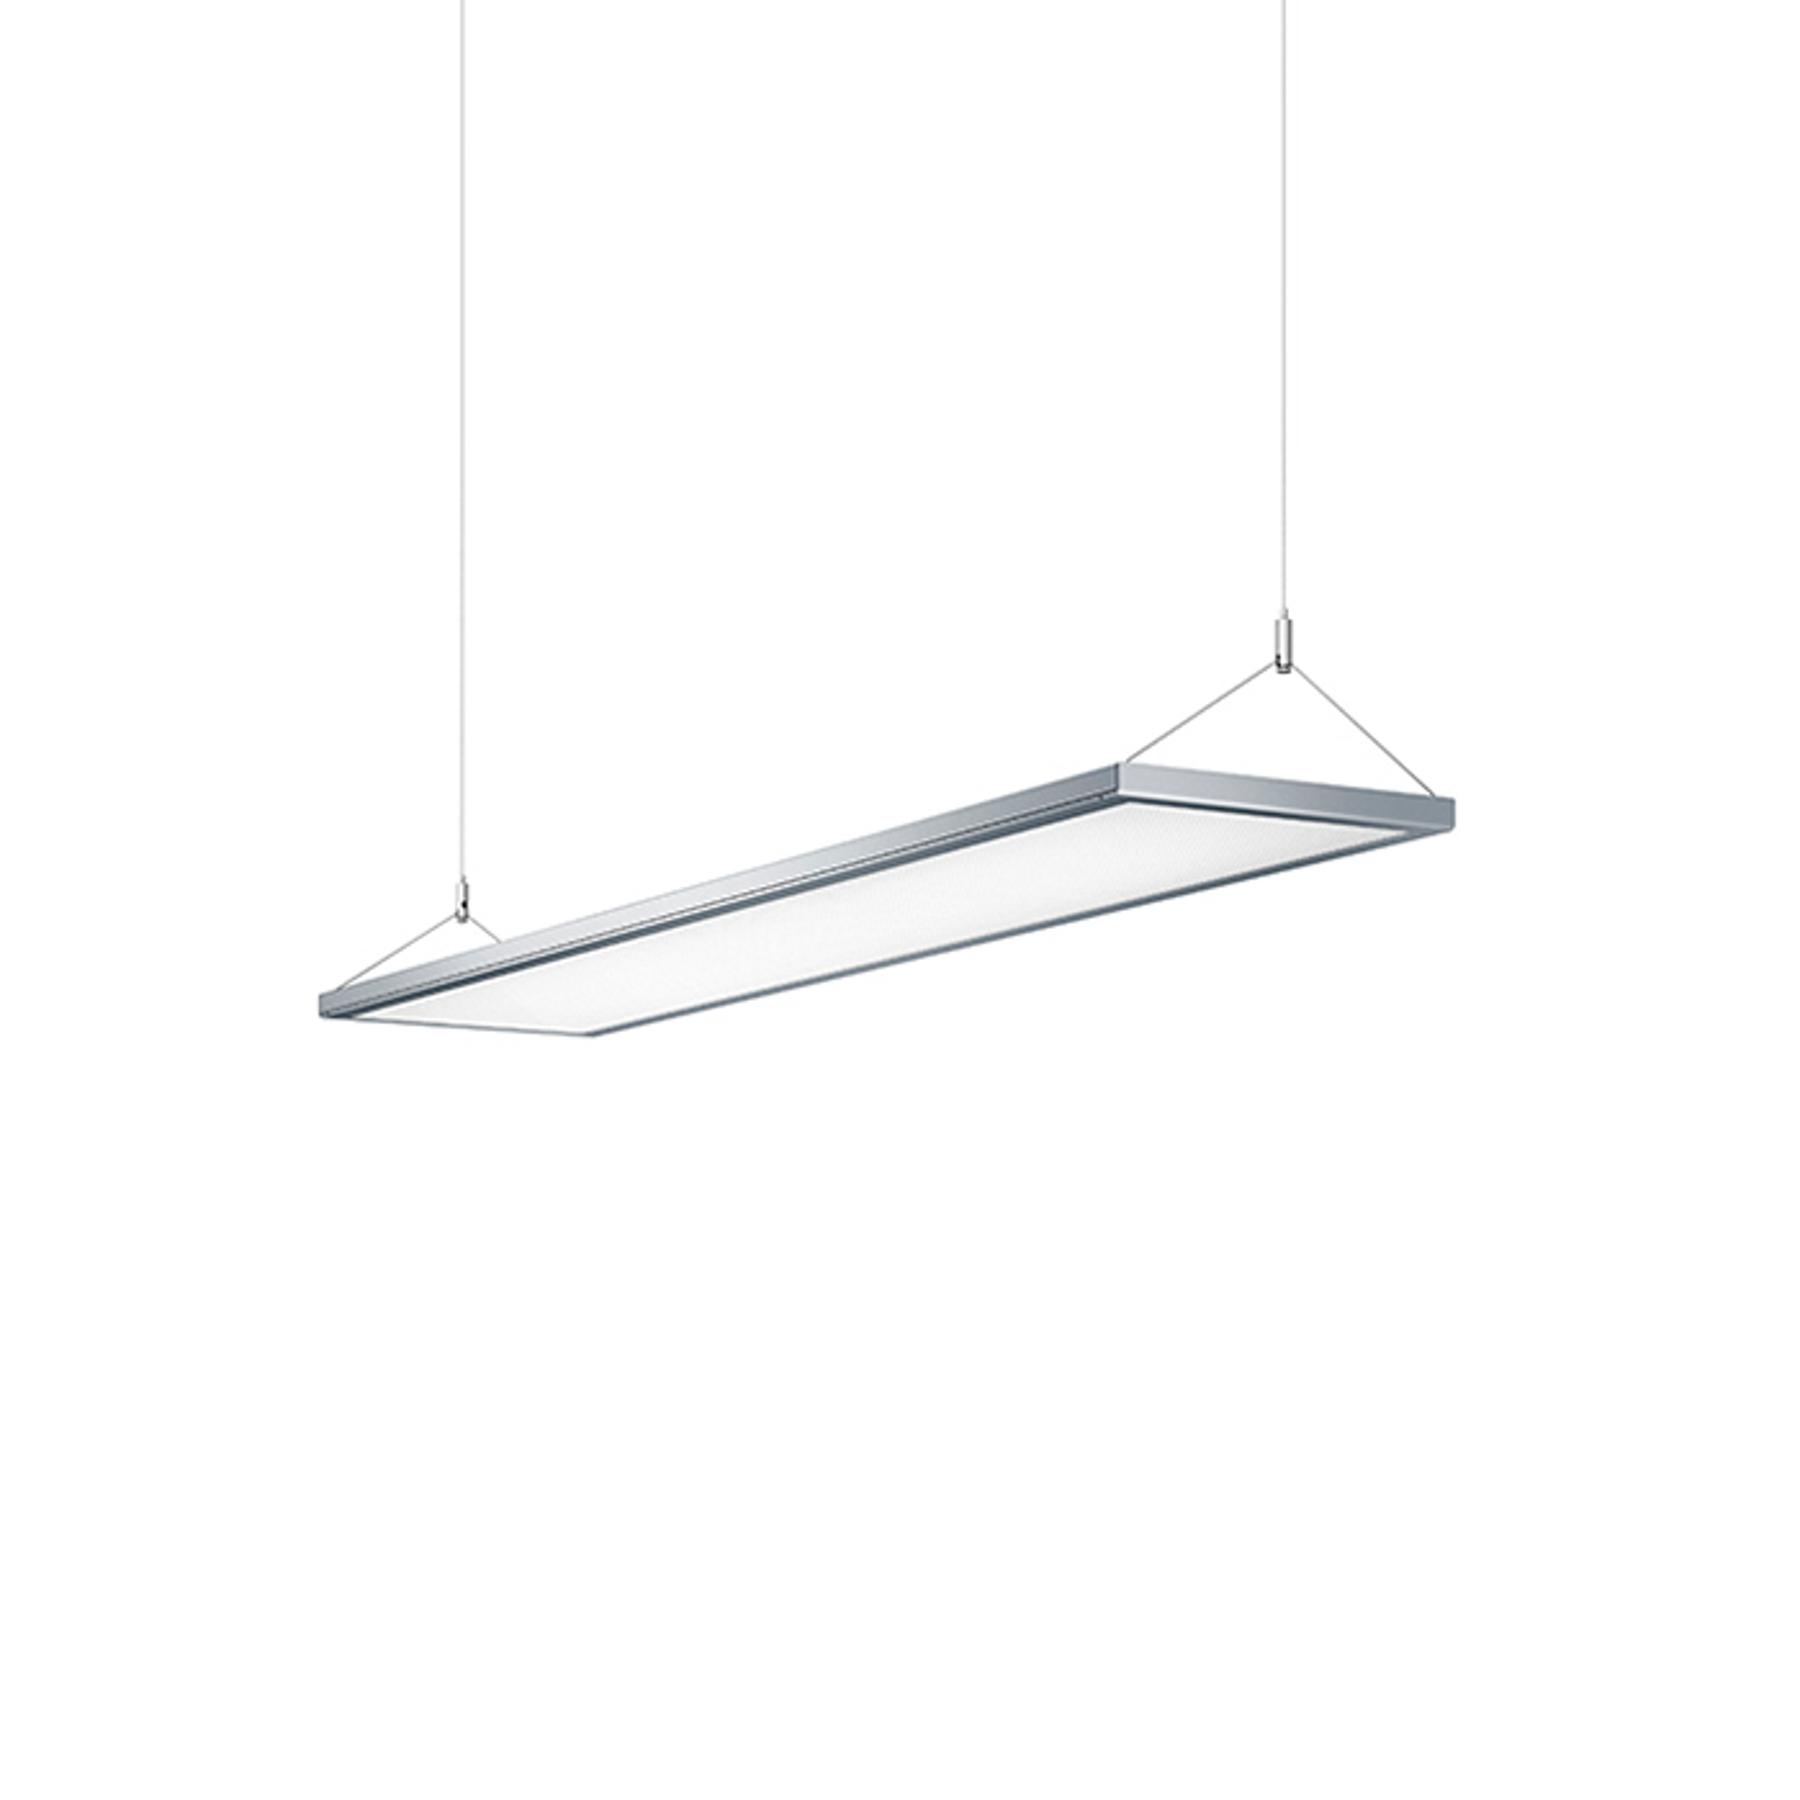 Lampa wisząca LED IDOO do biur 49W, srebrna